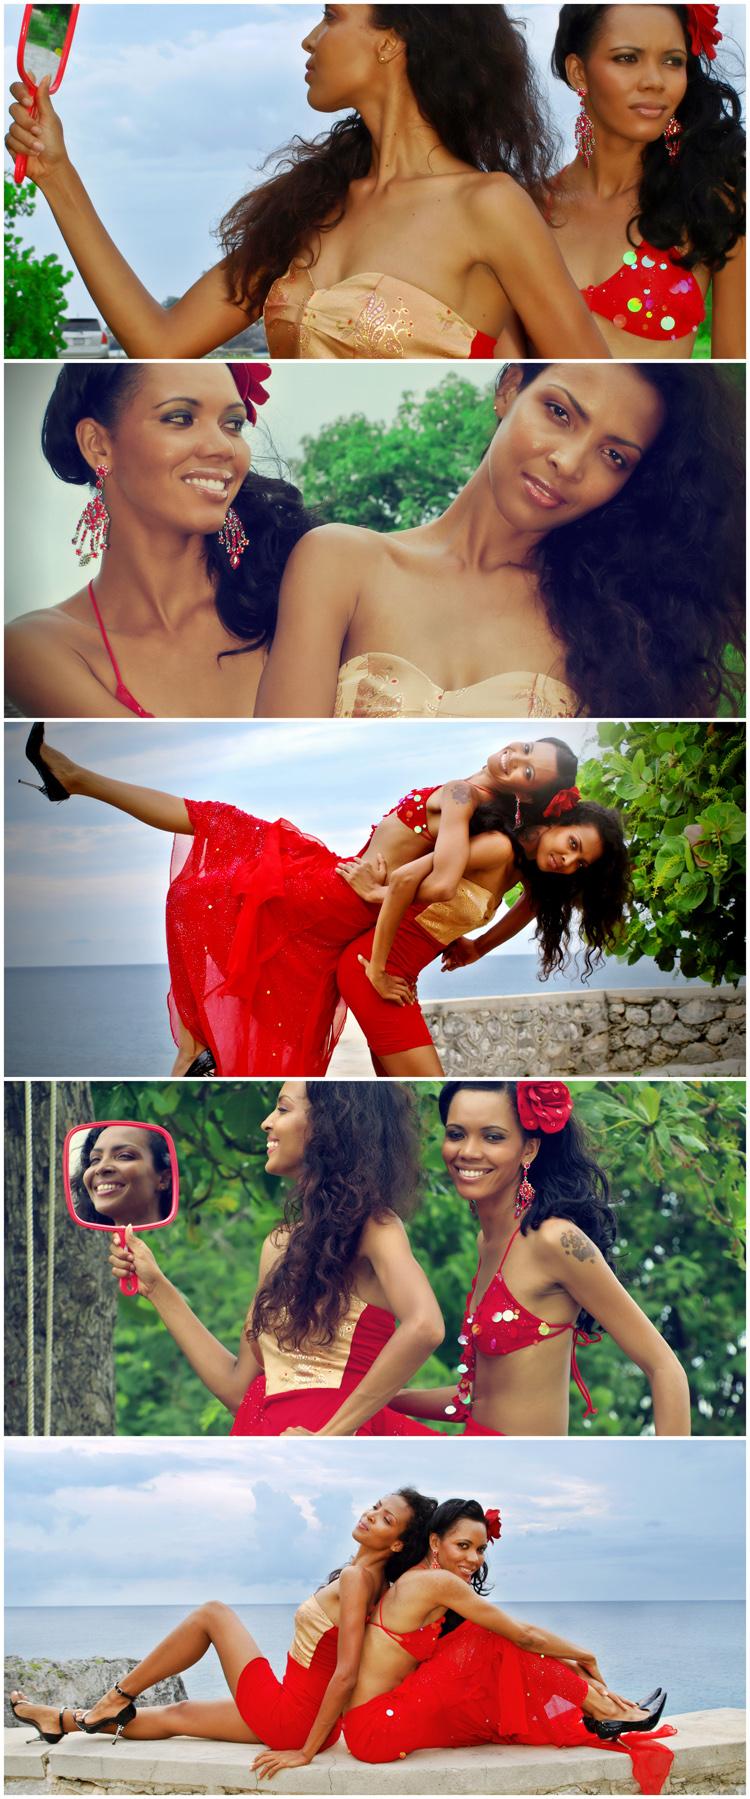 Negril, Jamaica. Jun 11, 2010 Cosmotees PhotoOvr Nicky Kerr & Nicolette Gomex